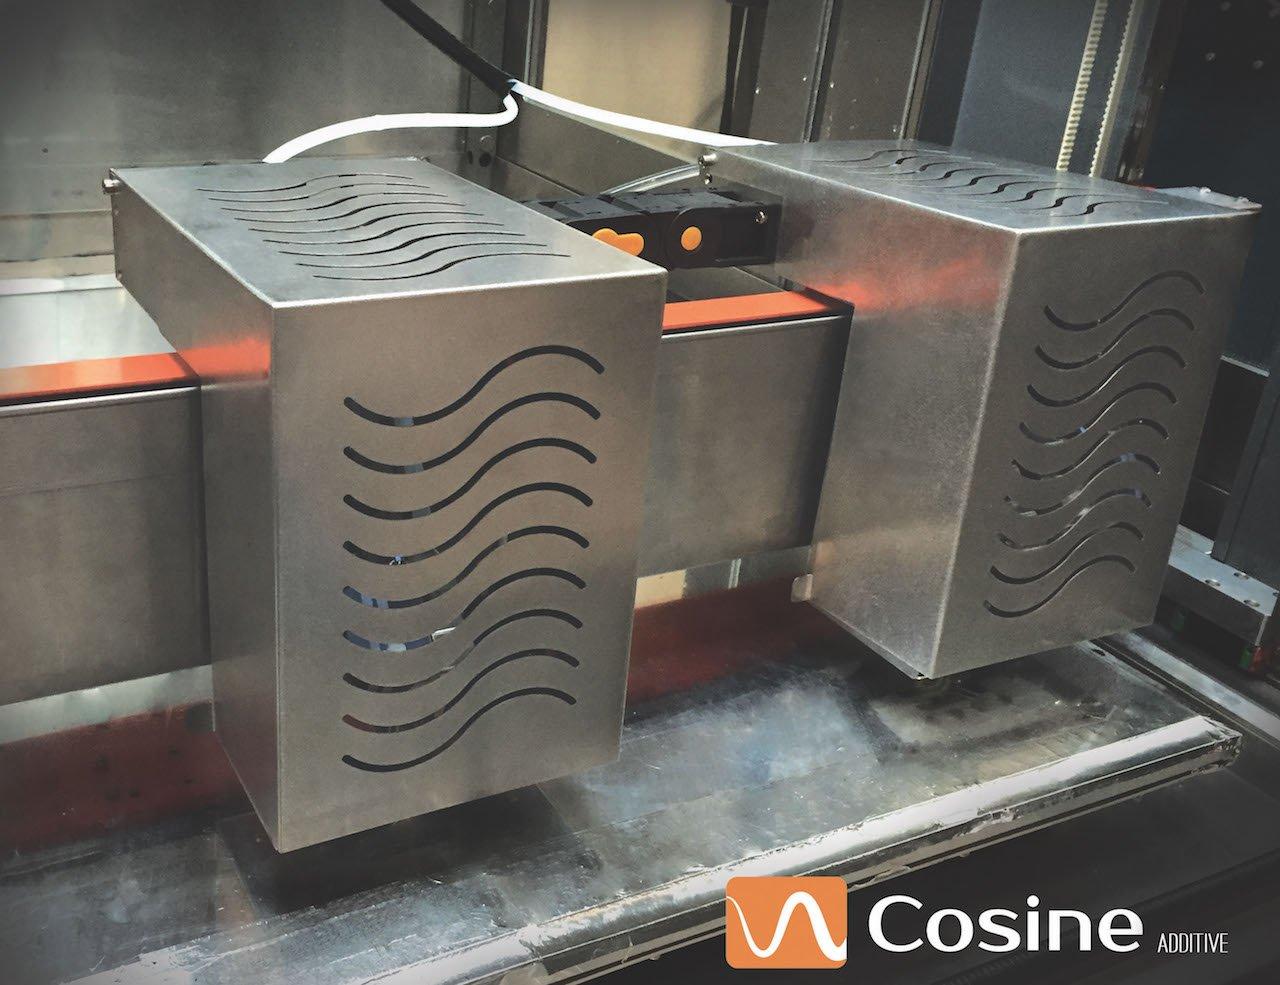 Cosine Additive's new Tandem extrusion system